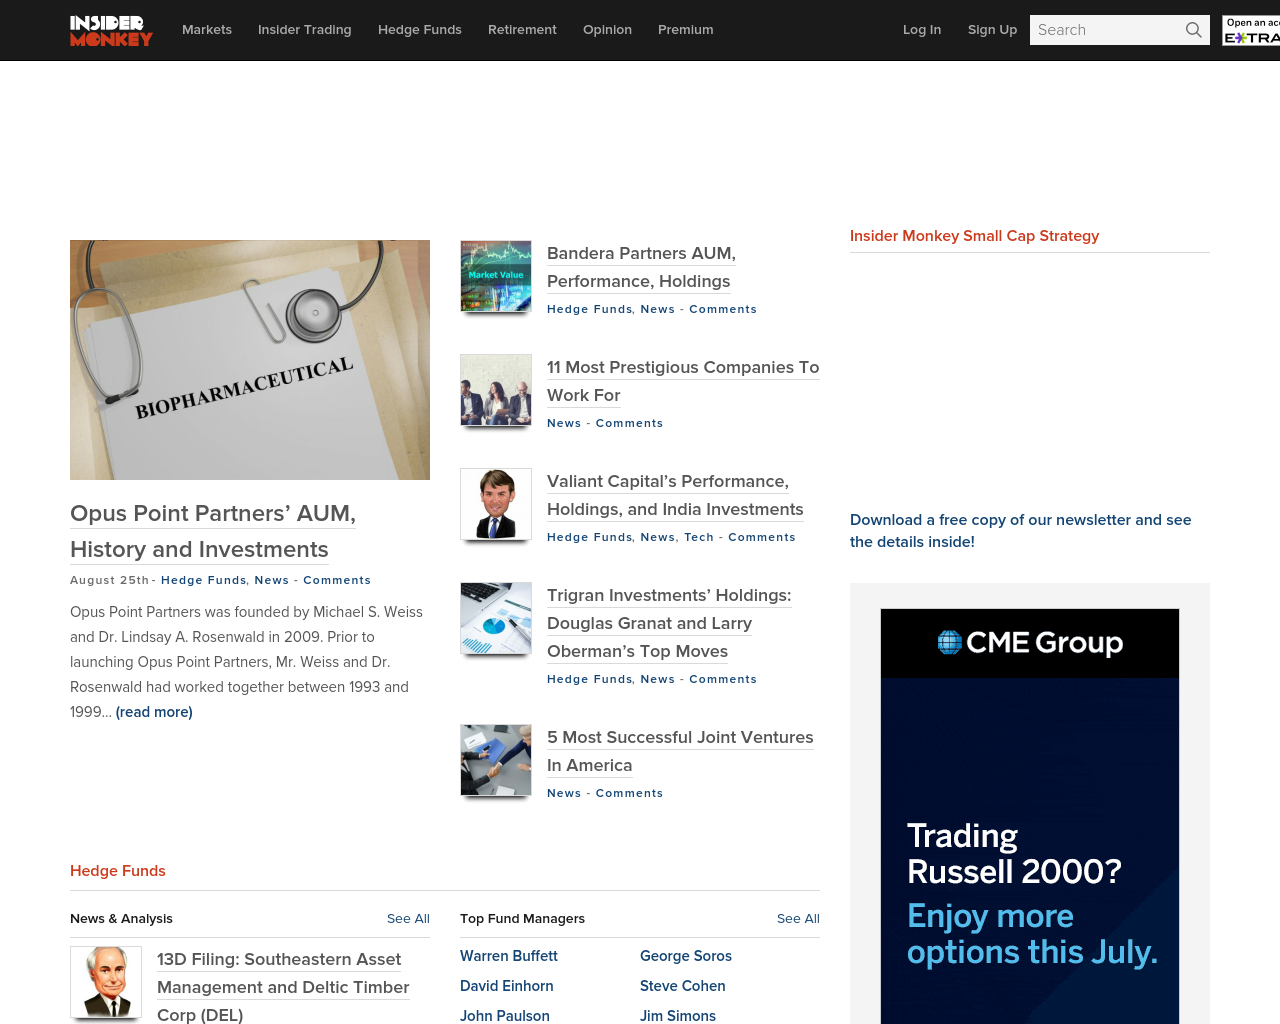 Insider-Monkey-Advertising-Reviews-Pricing